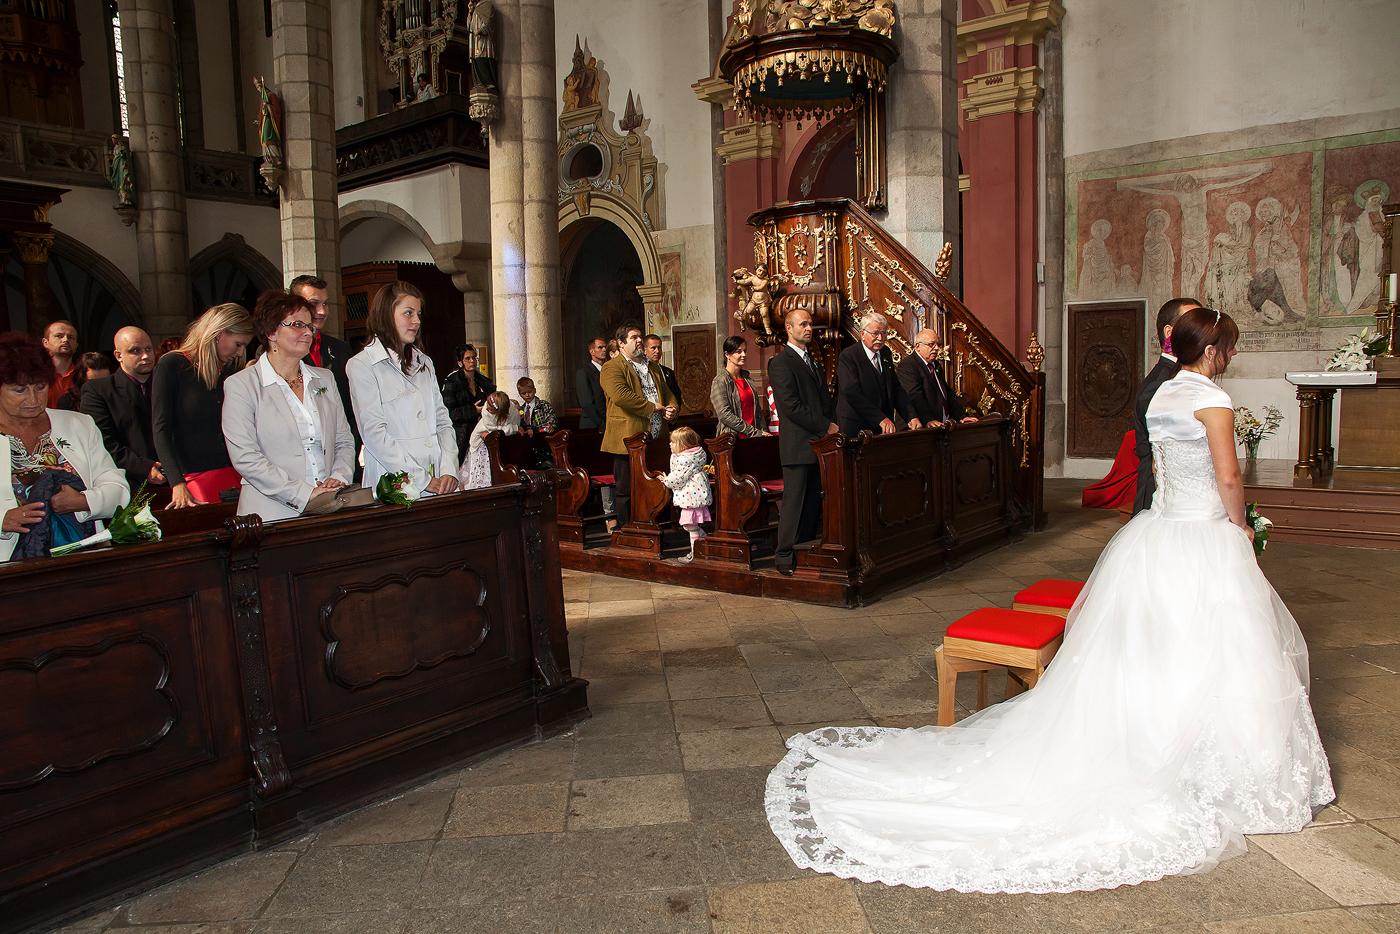 Svatba Český Krumlov - svatební fotograf Daniel Rataj